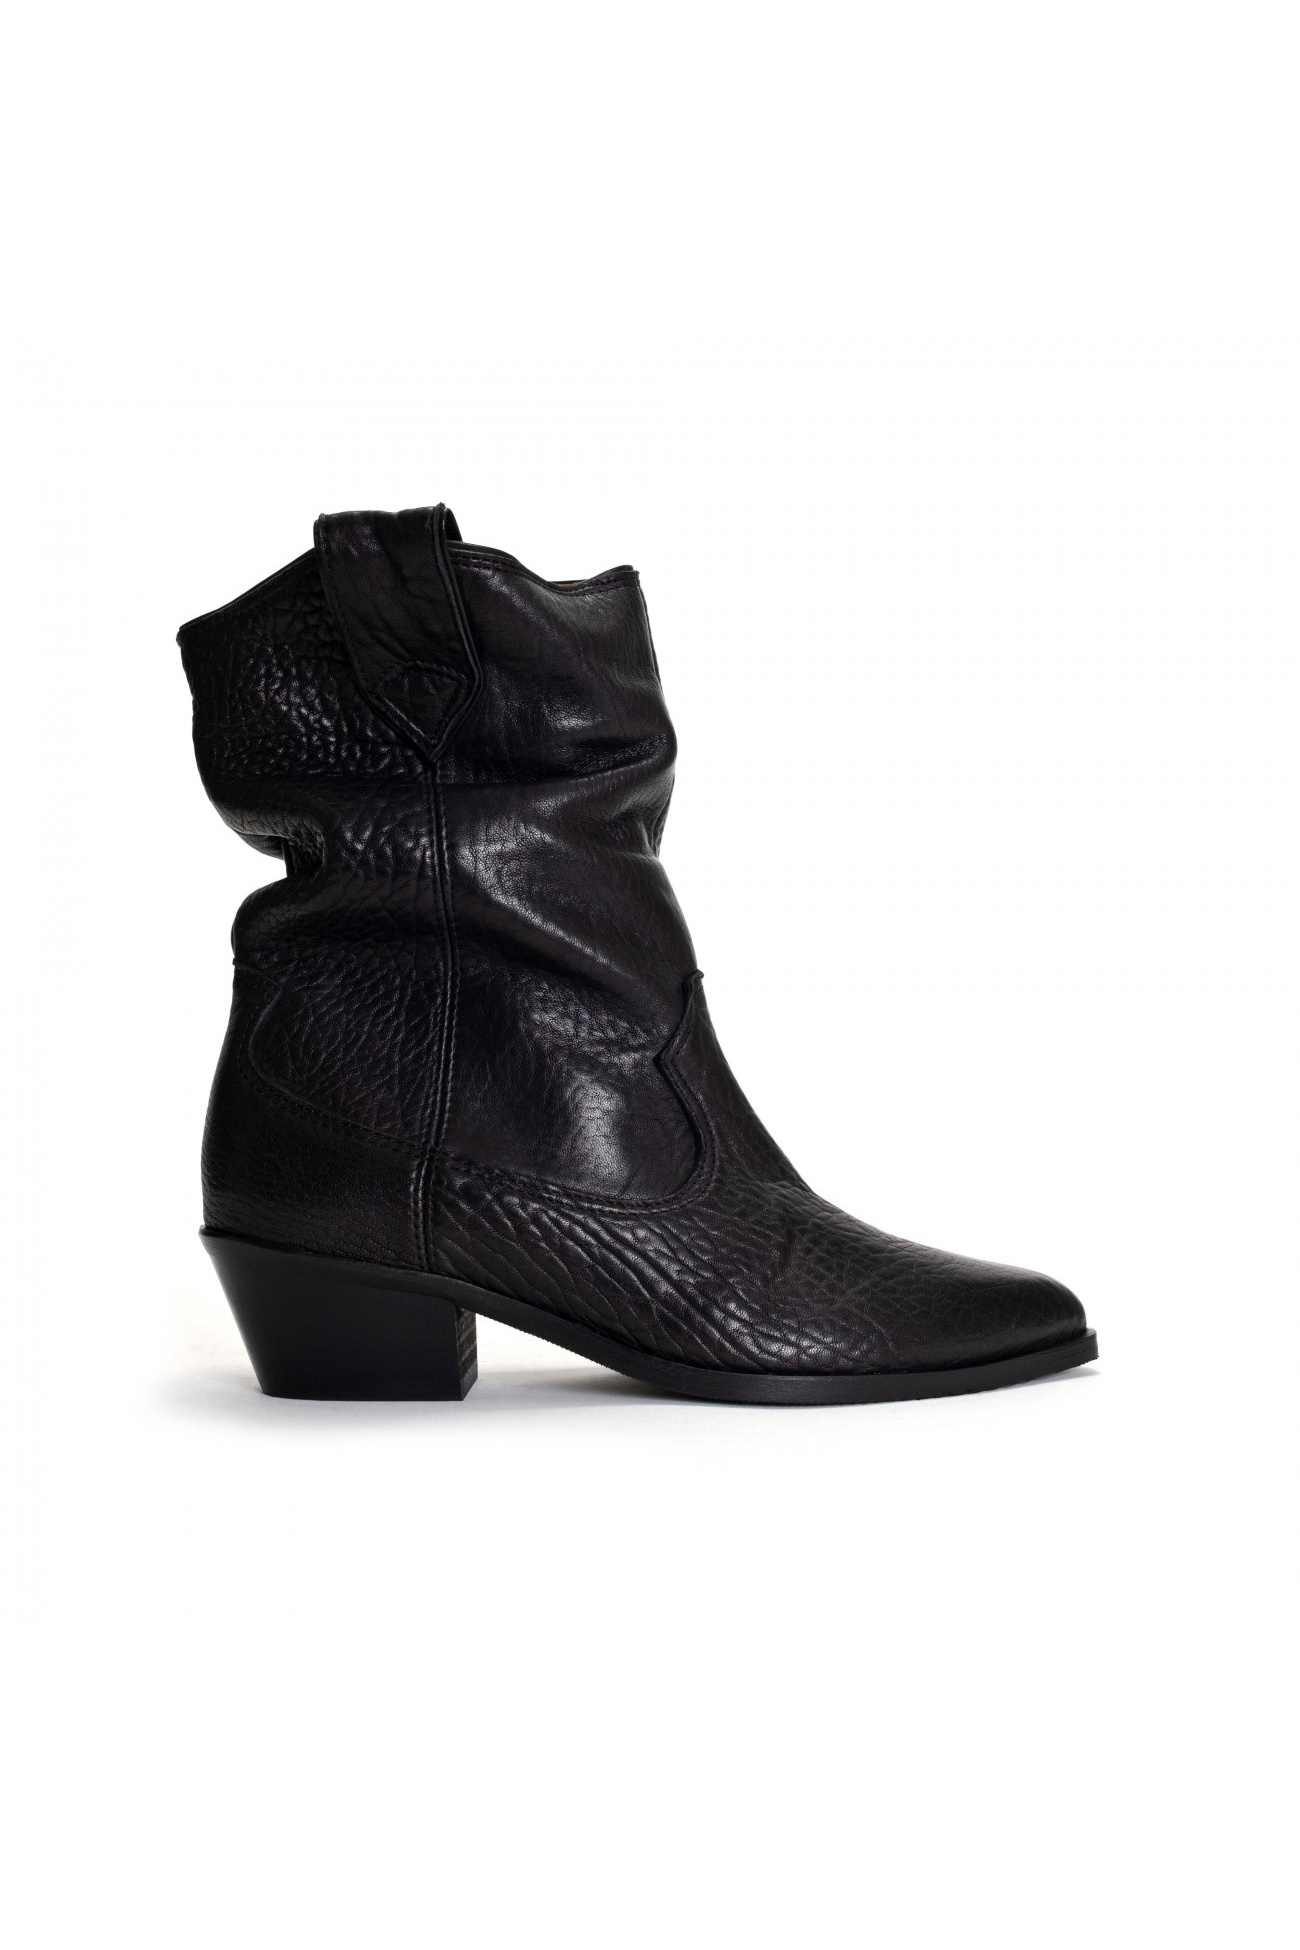 Saseline 35 Heavy Grain Calf Boot - Black-1